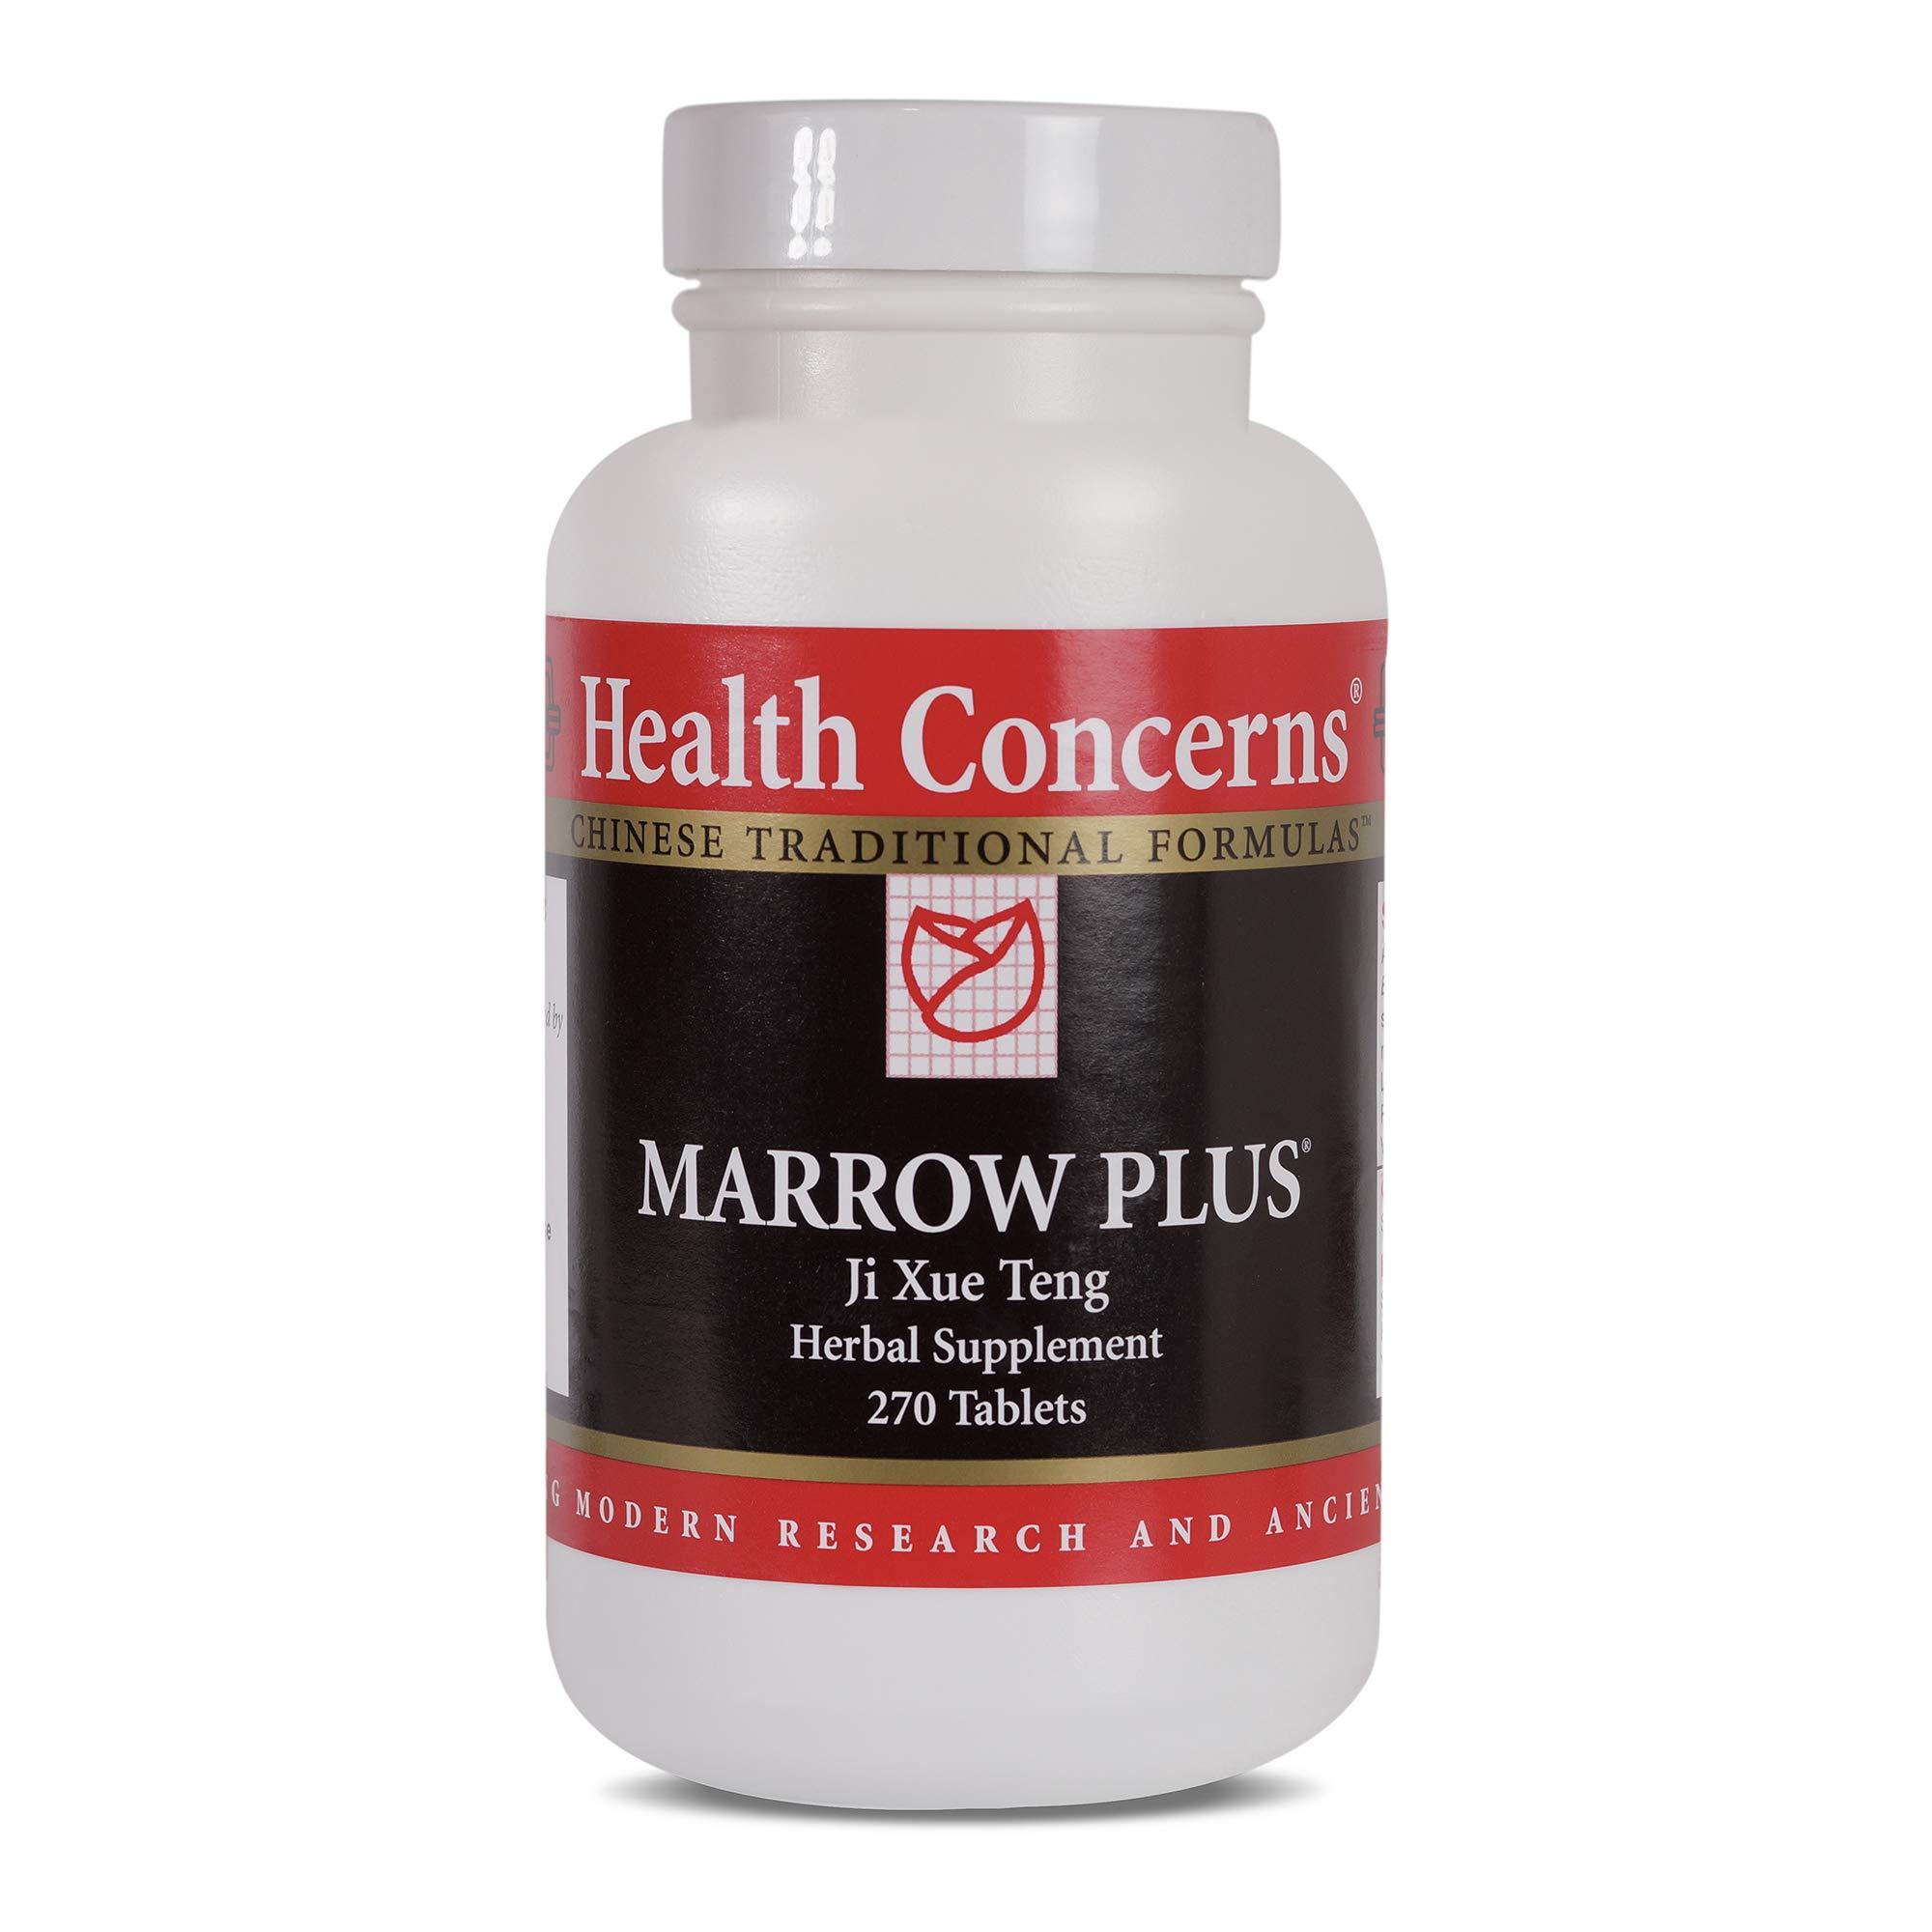 Health Concerns - Marrow Plus - Ji Xue Teng Herbal Supplement - 270 Tablets